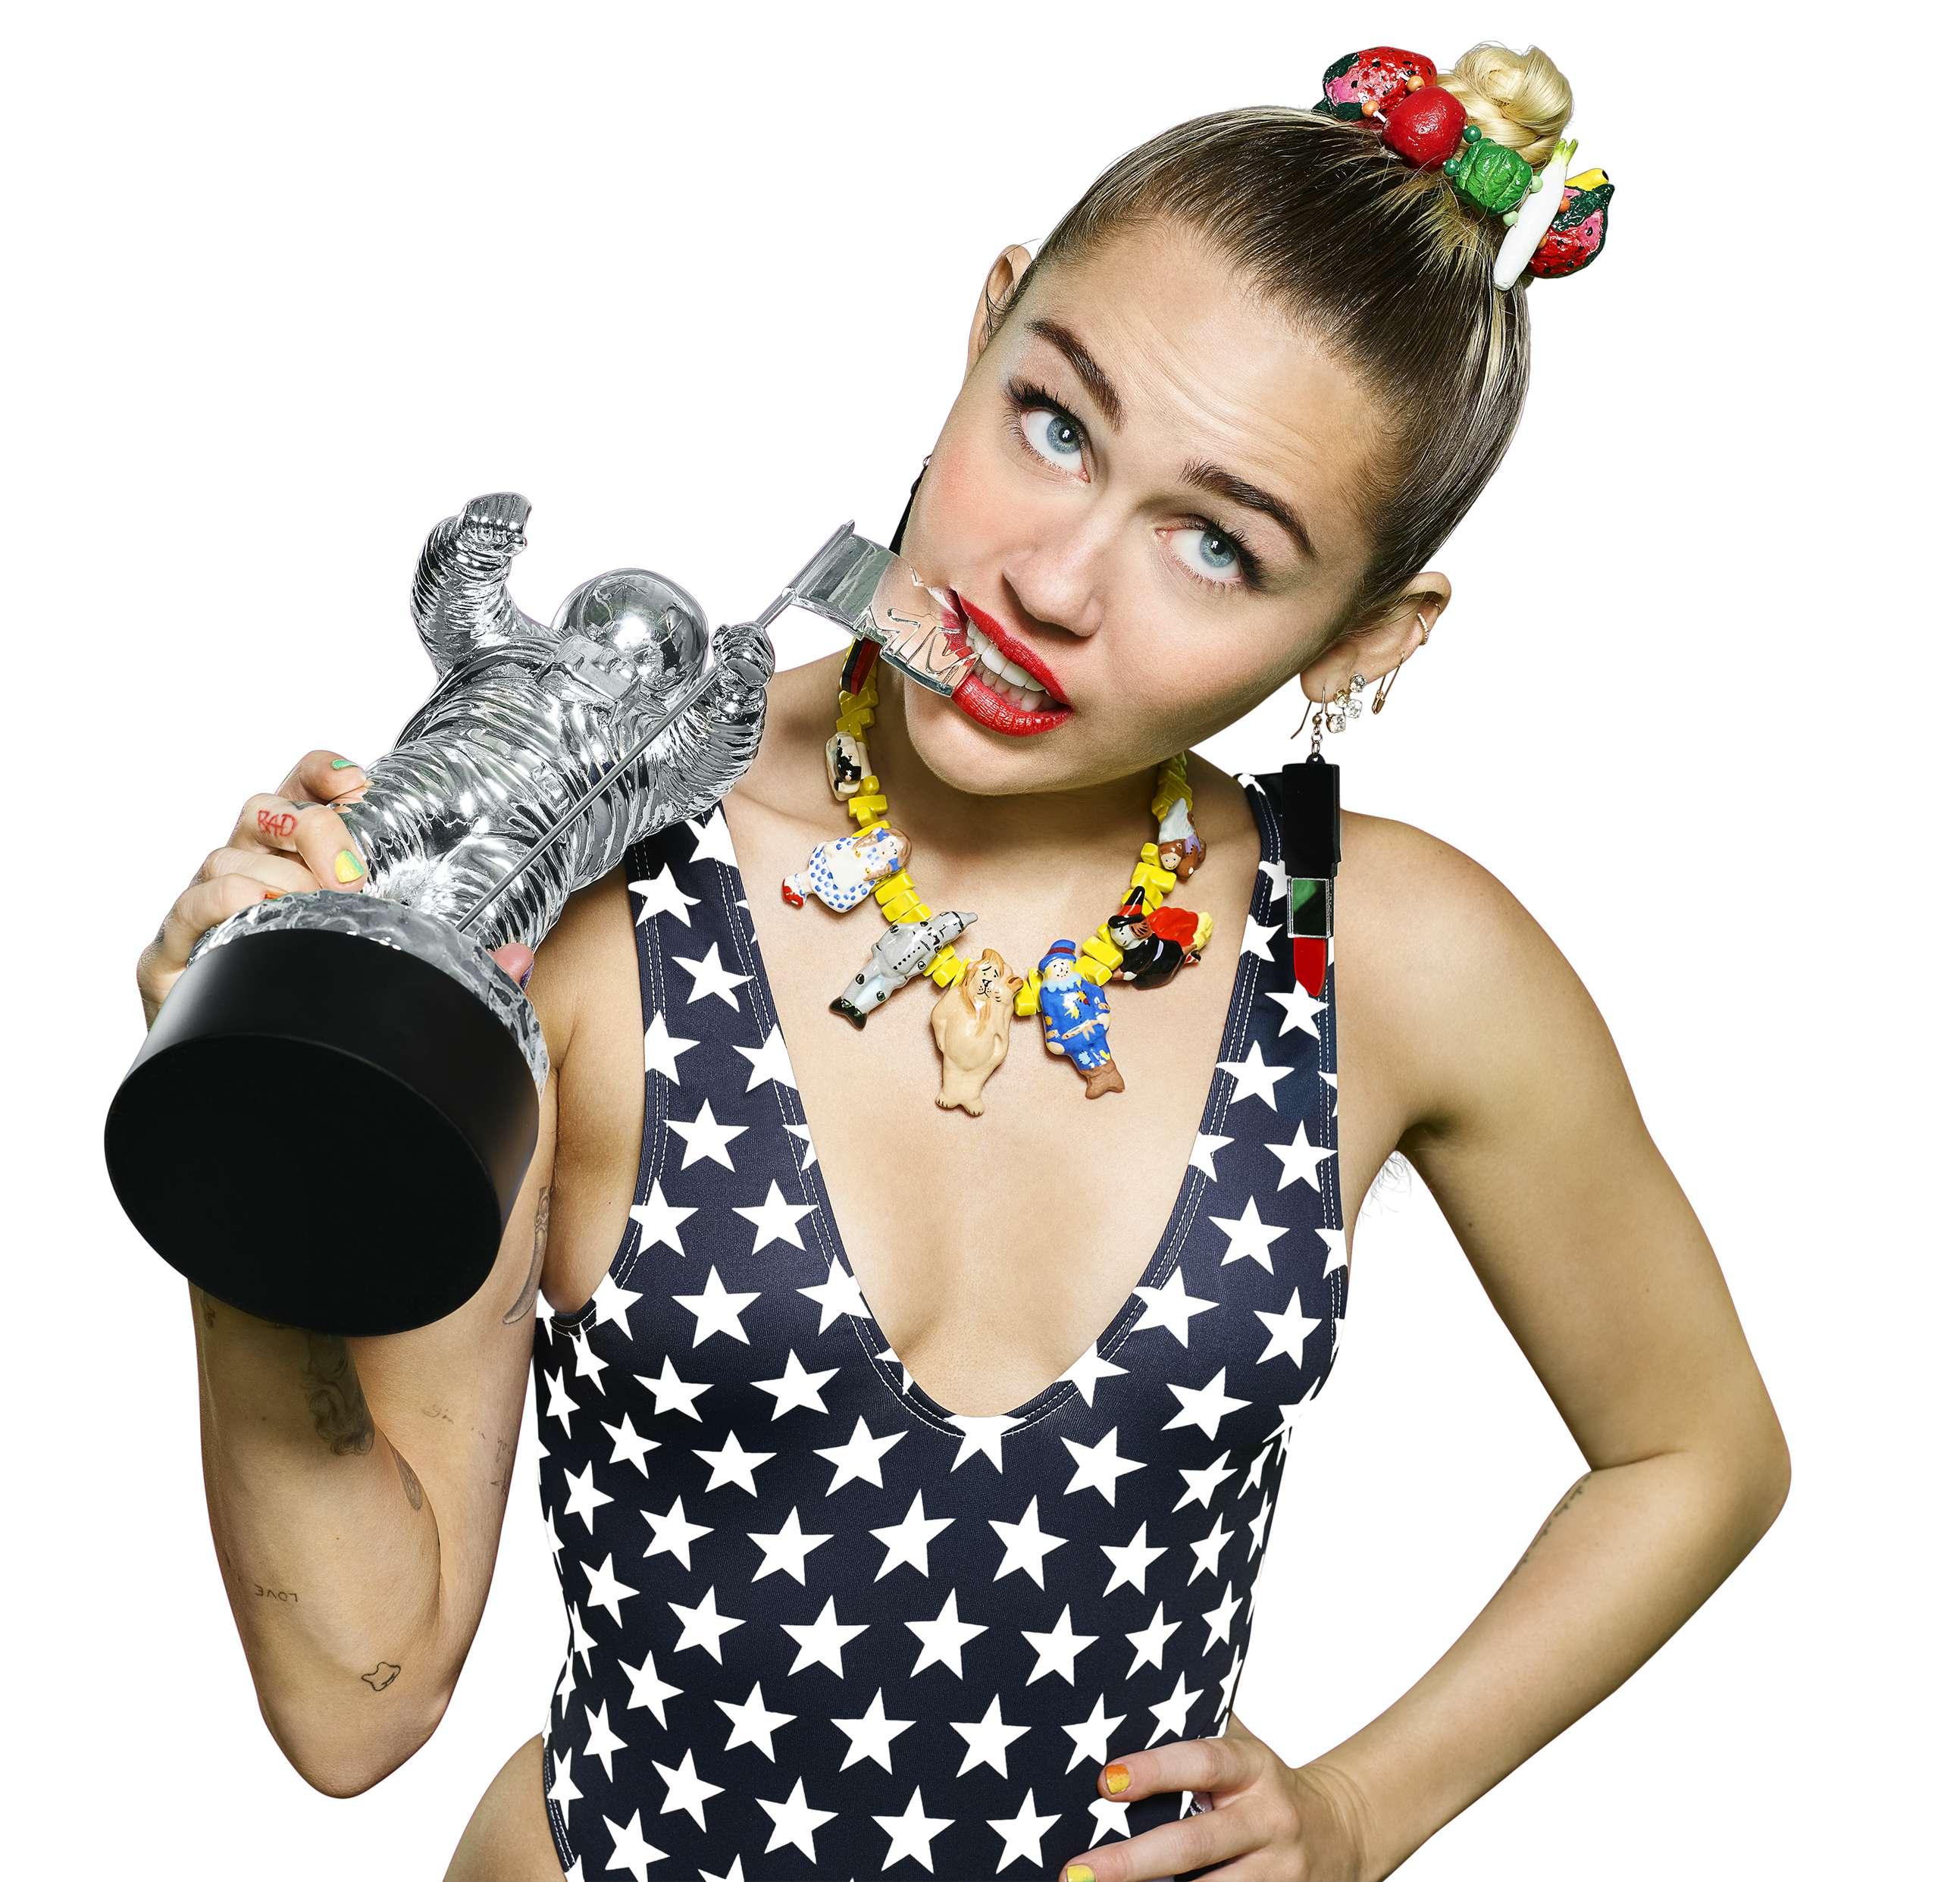 Miley Cyrus Sexy (6 Photos)